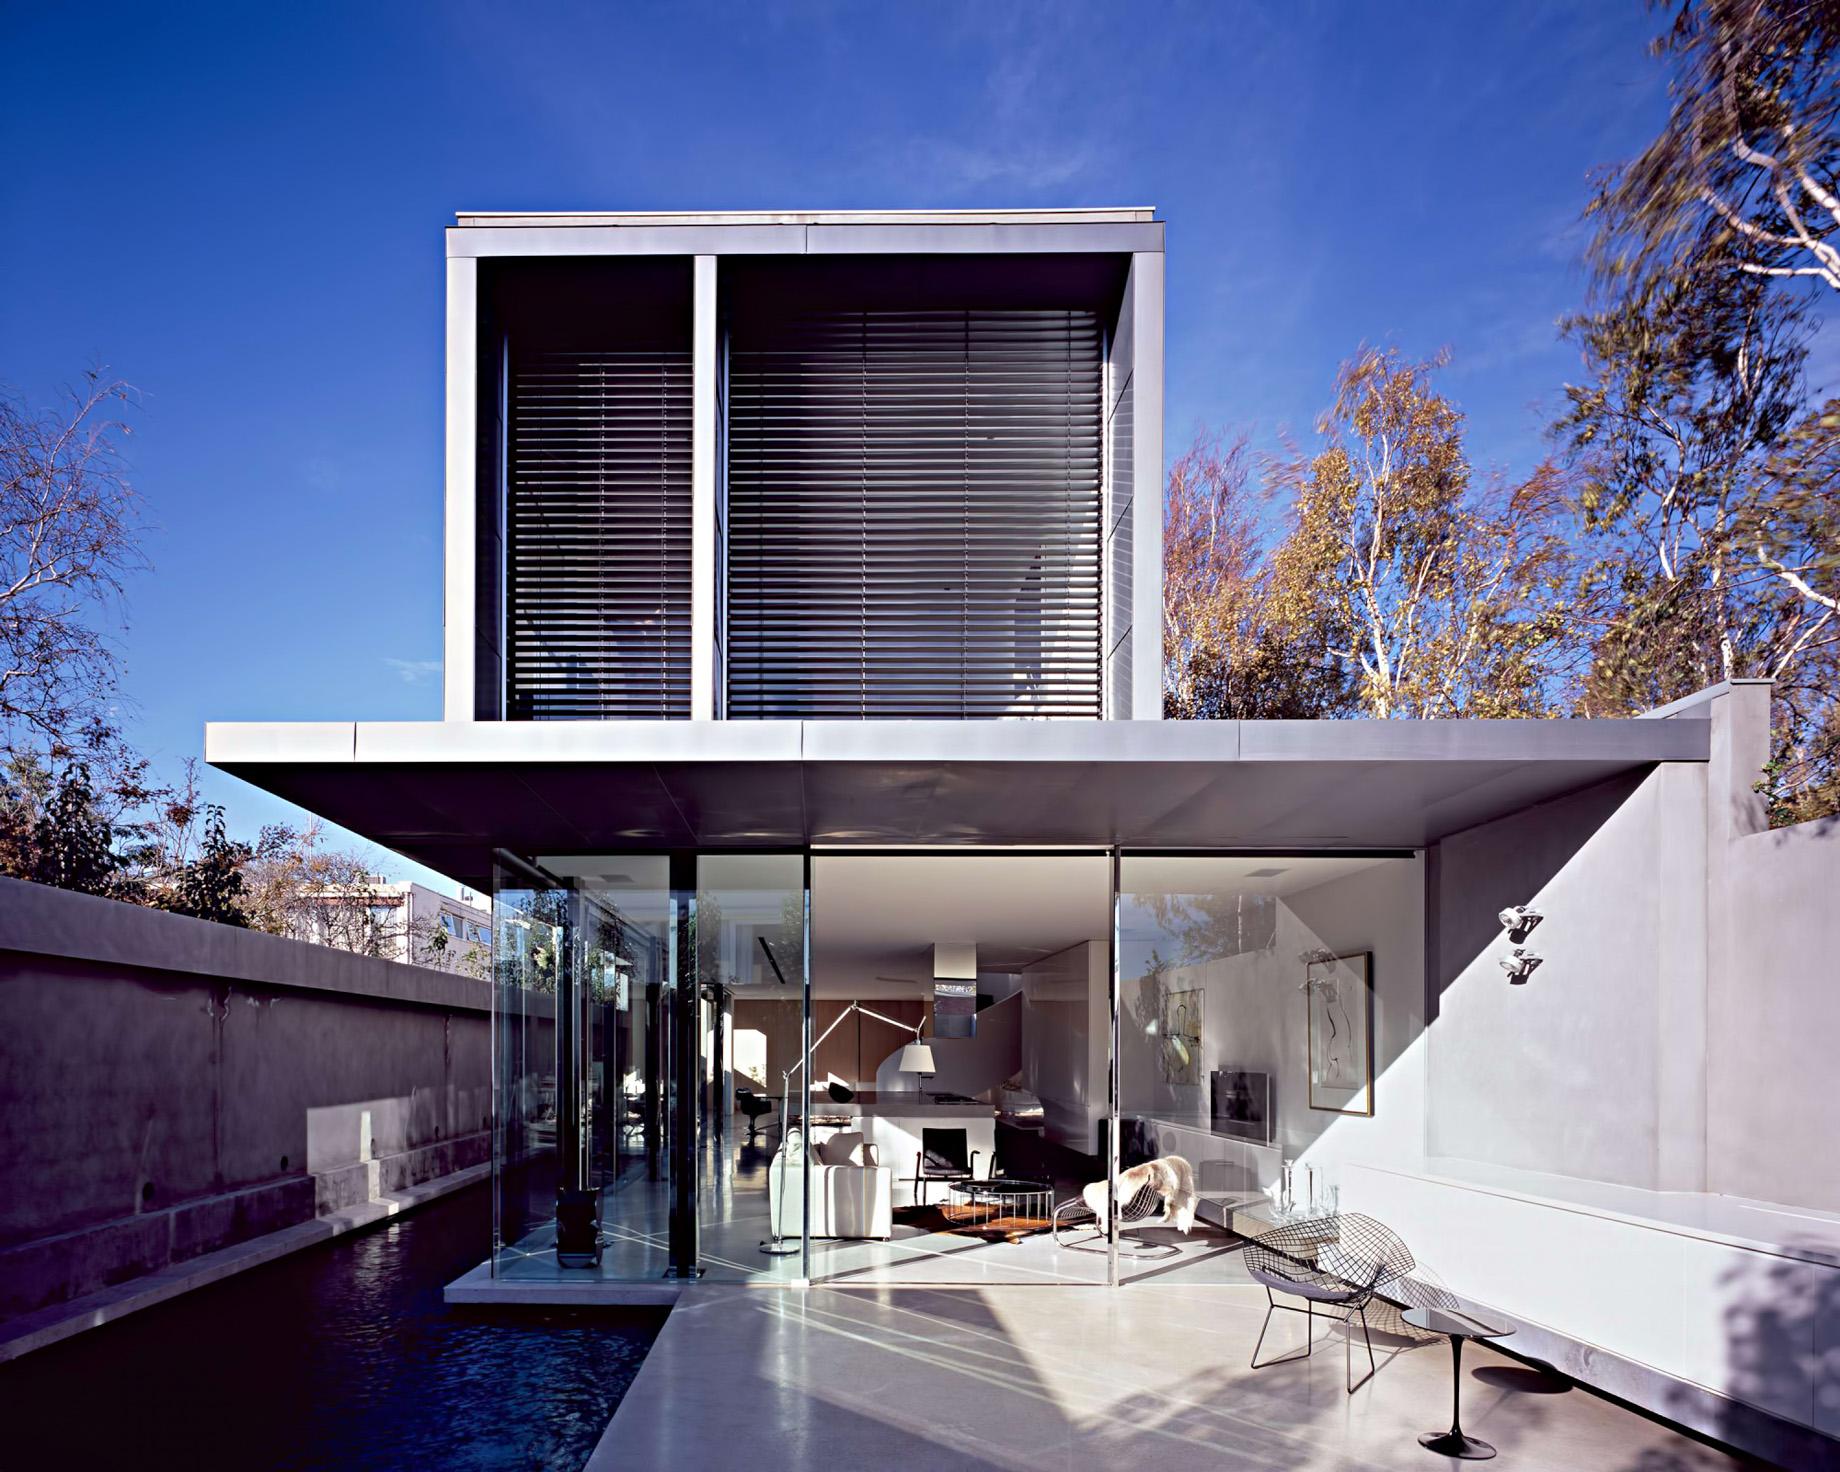 29 Ross Street - Toorak, Melbourne, Victoria, Australia